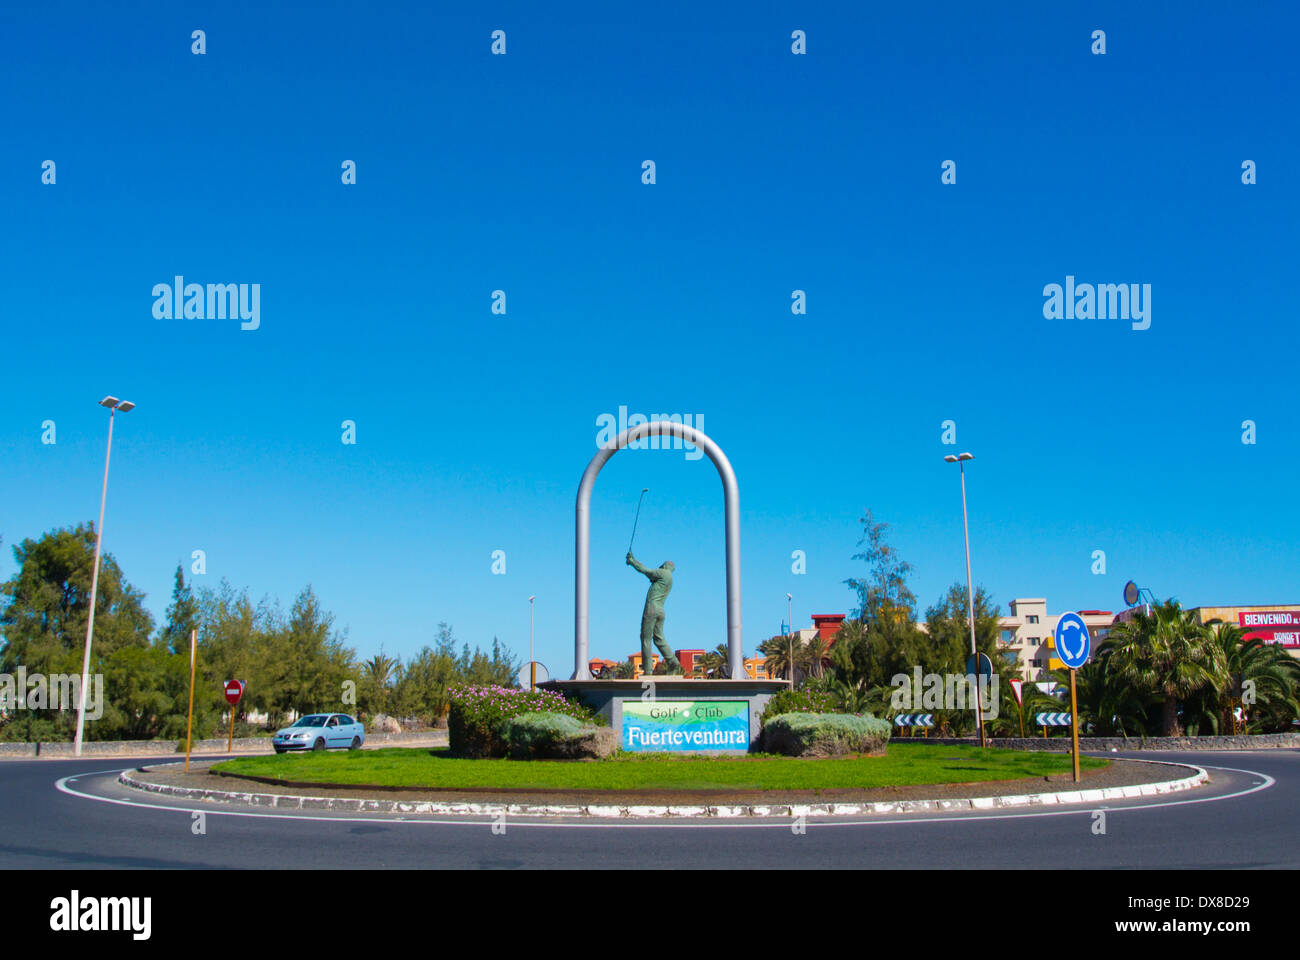 Golf club advert in a roundabout, Caleta de Fuste, Fuerteventura, Canary Islands, Spain, Europe - Stock Image